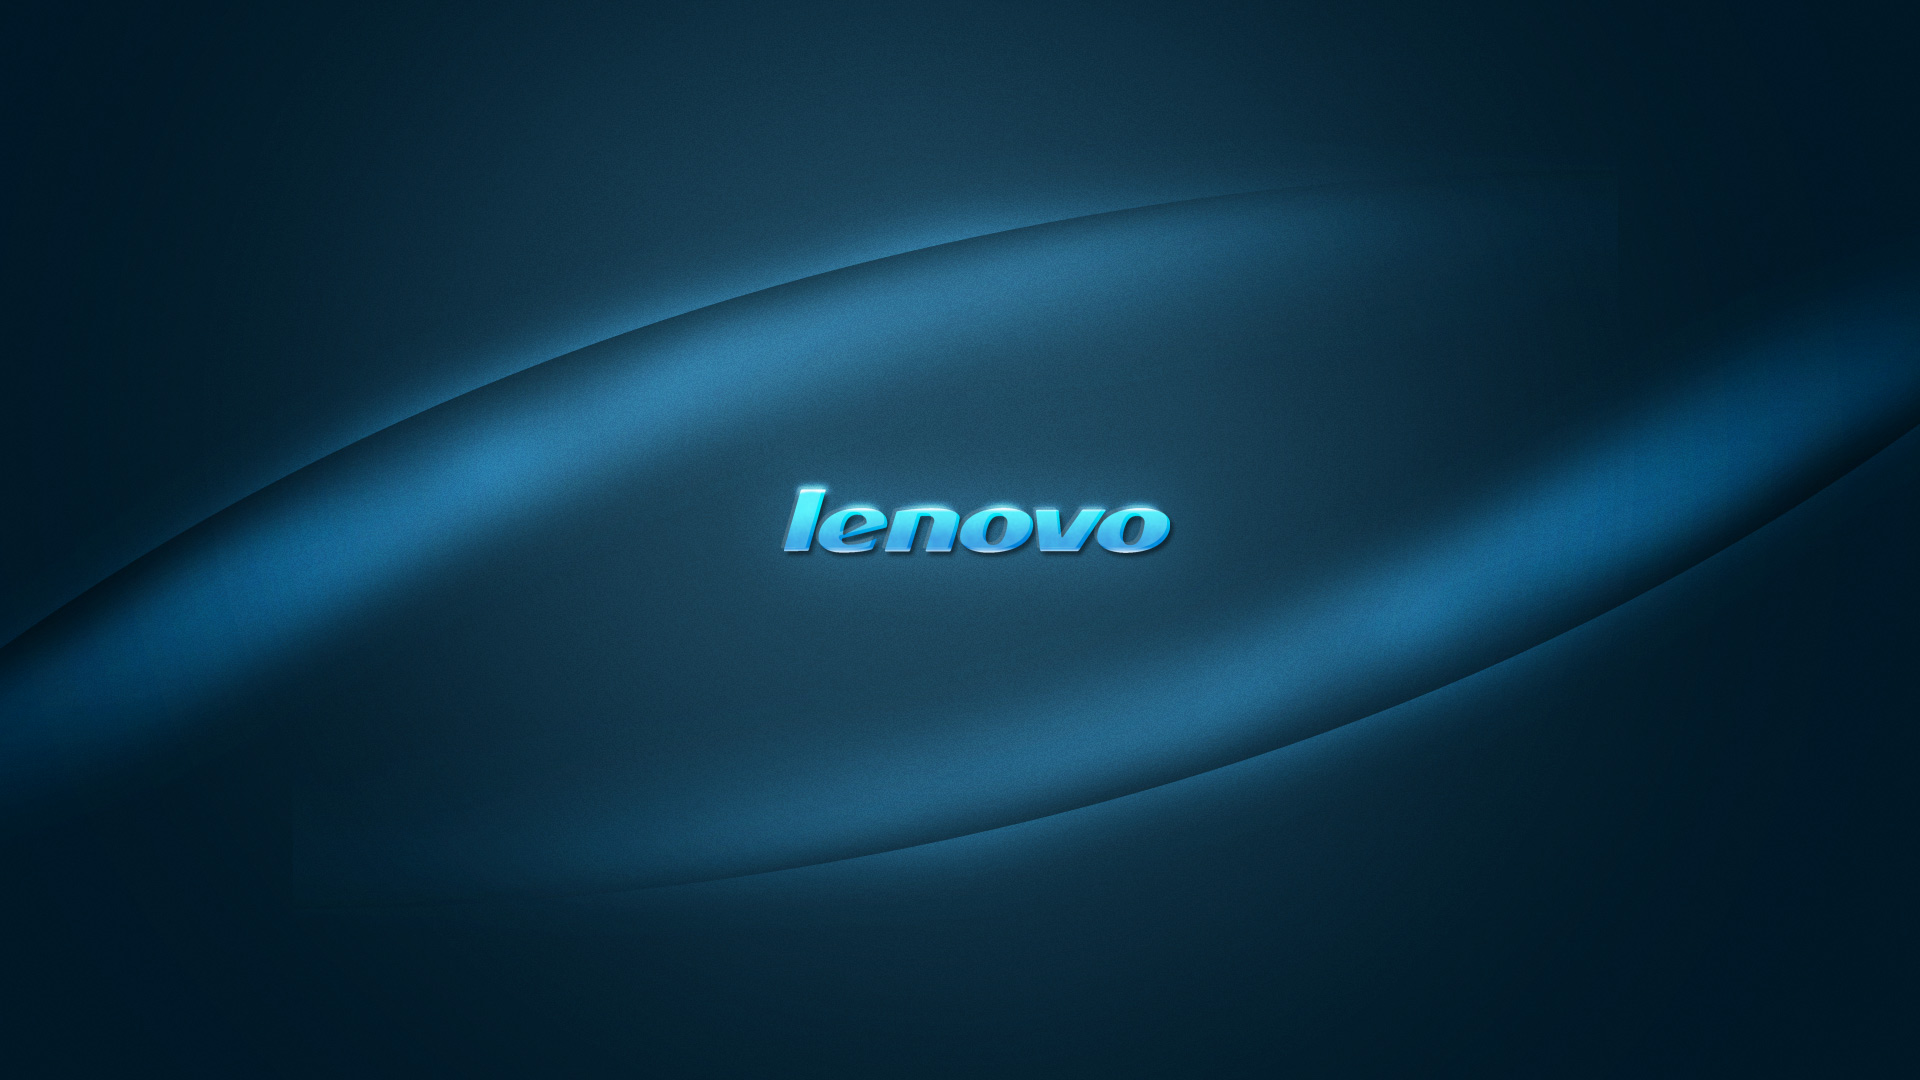 Lenovo Wallpapers Cute: Lenovo Desktop Wallpapers